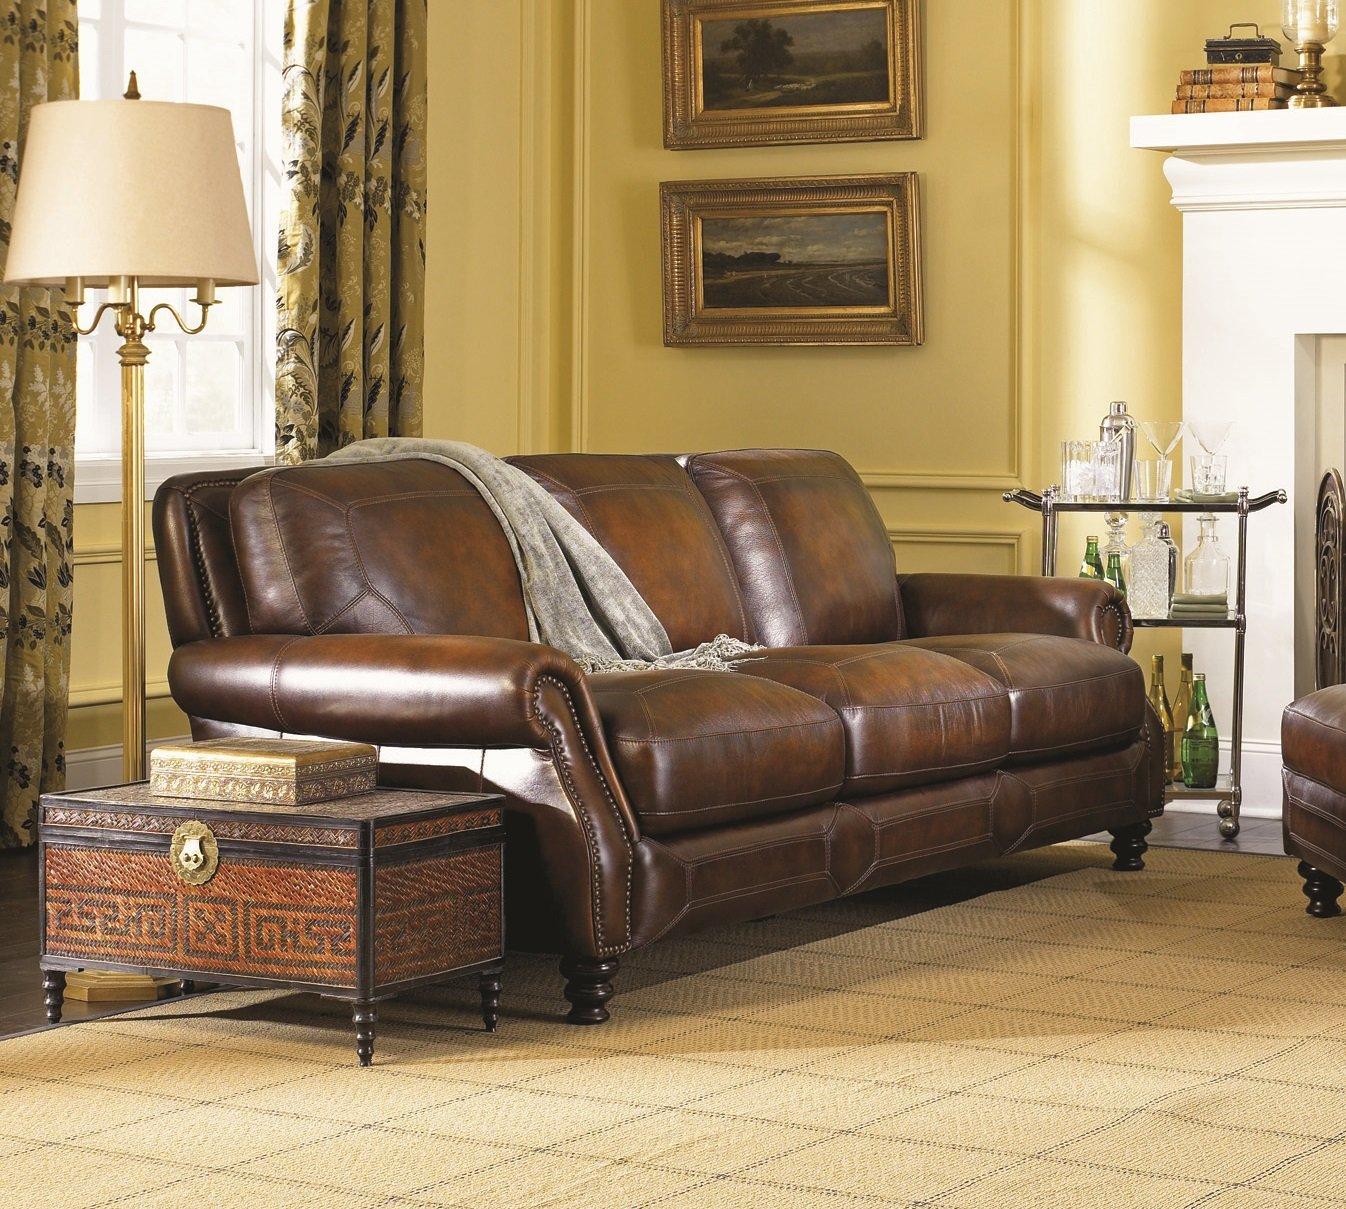 Chelsea Home Furniture Abilene Sofa - Hillsboro Prairie Meadows